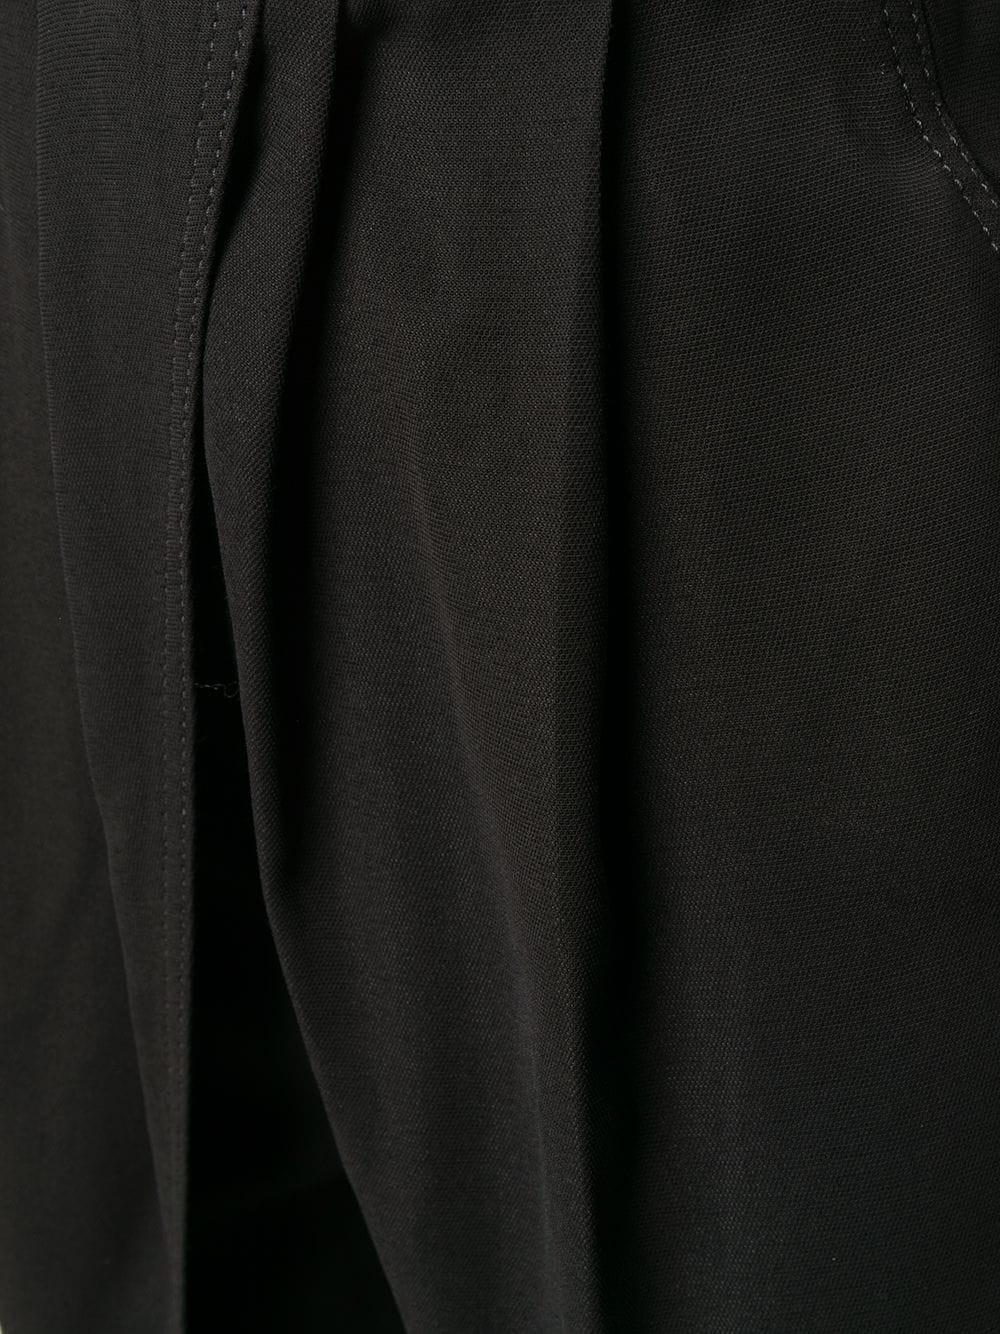 Crepe viscose pants with cuts